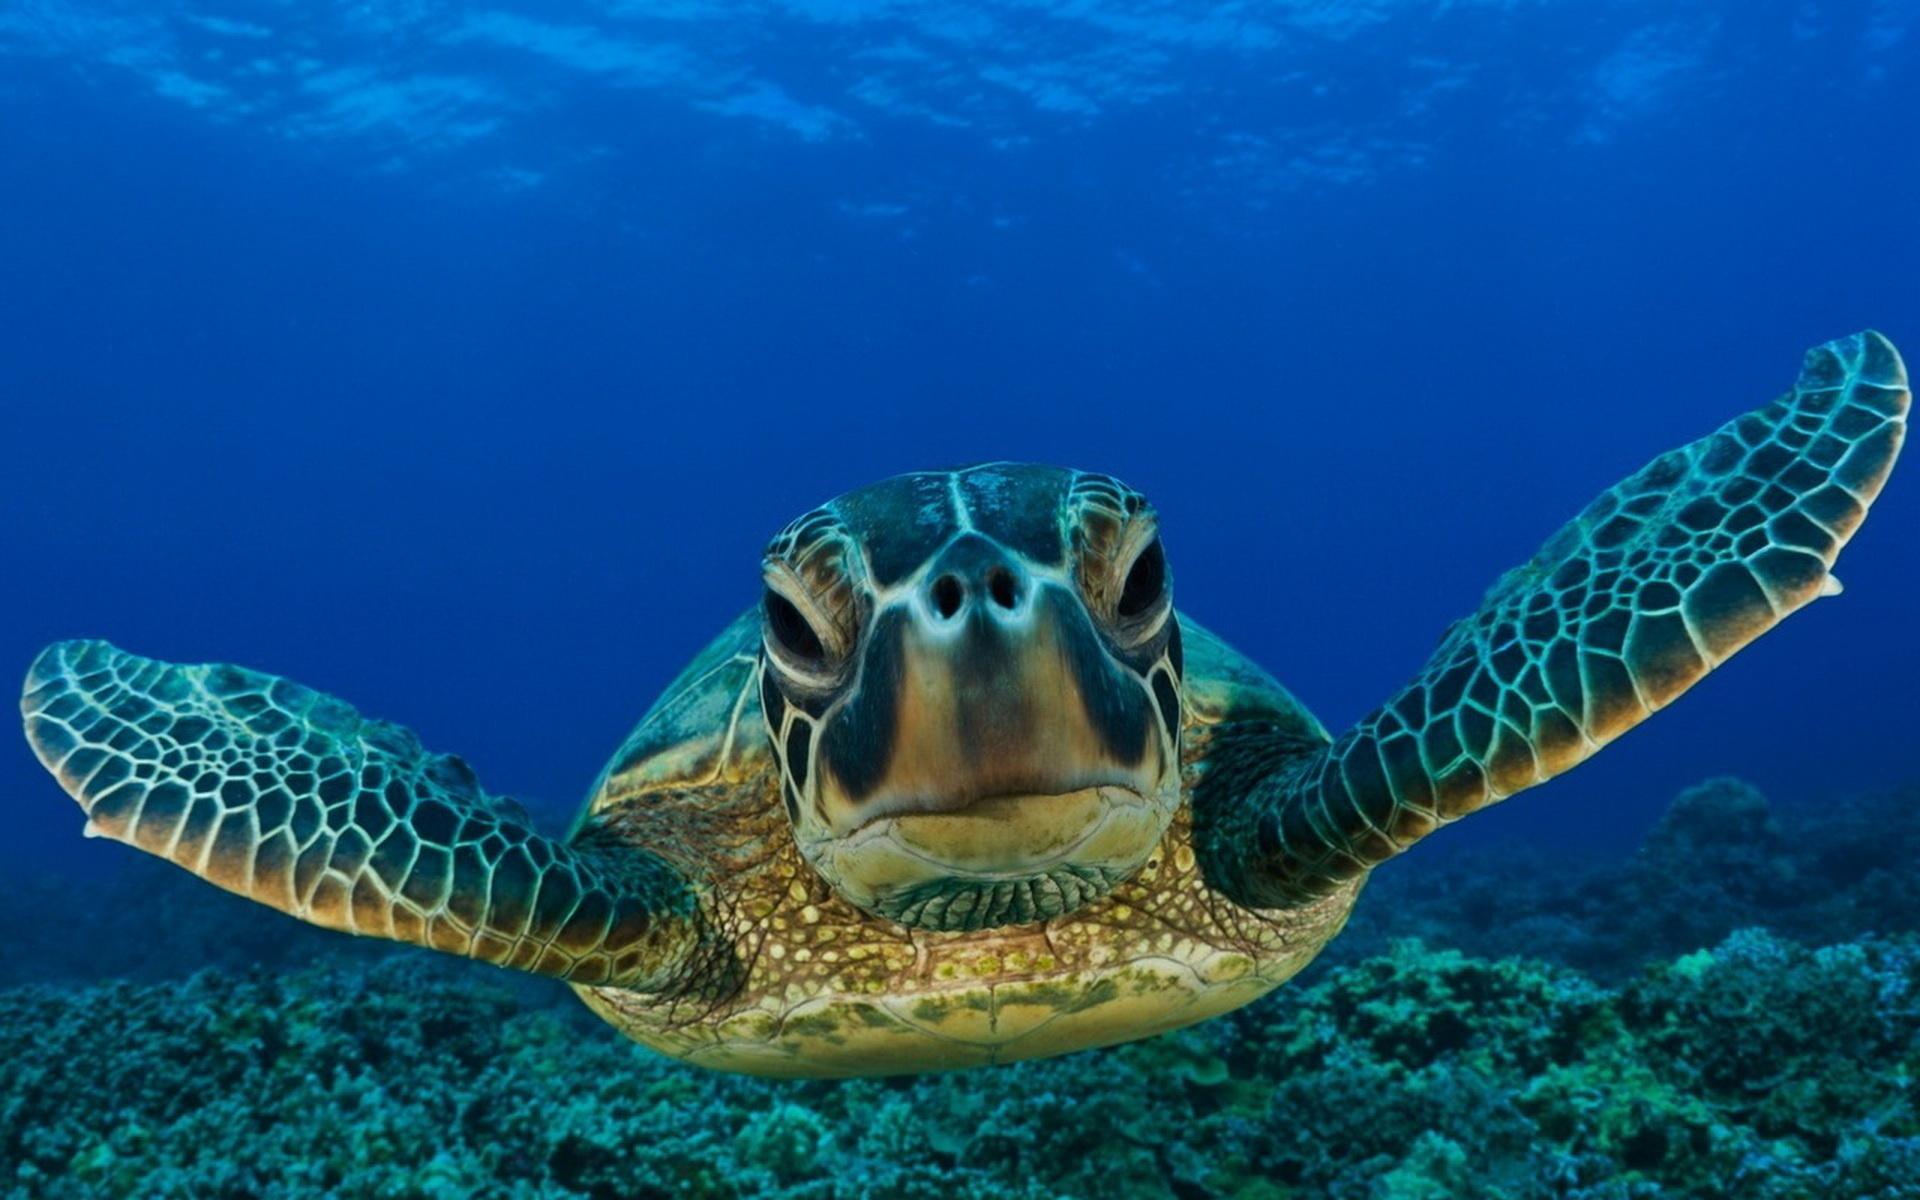 Animals reptiles turtles sea life ocean underwater water swim float